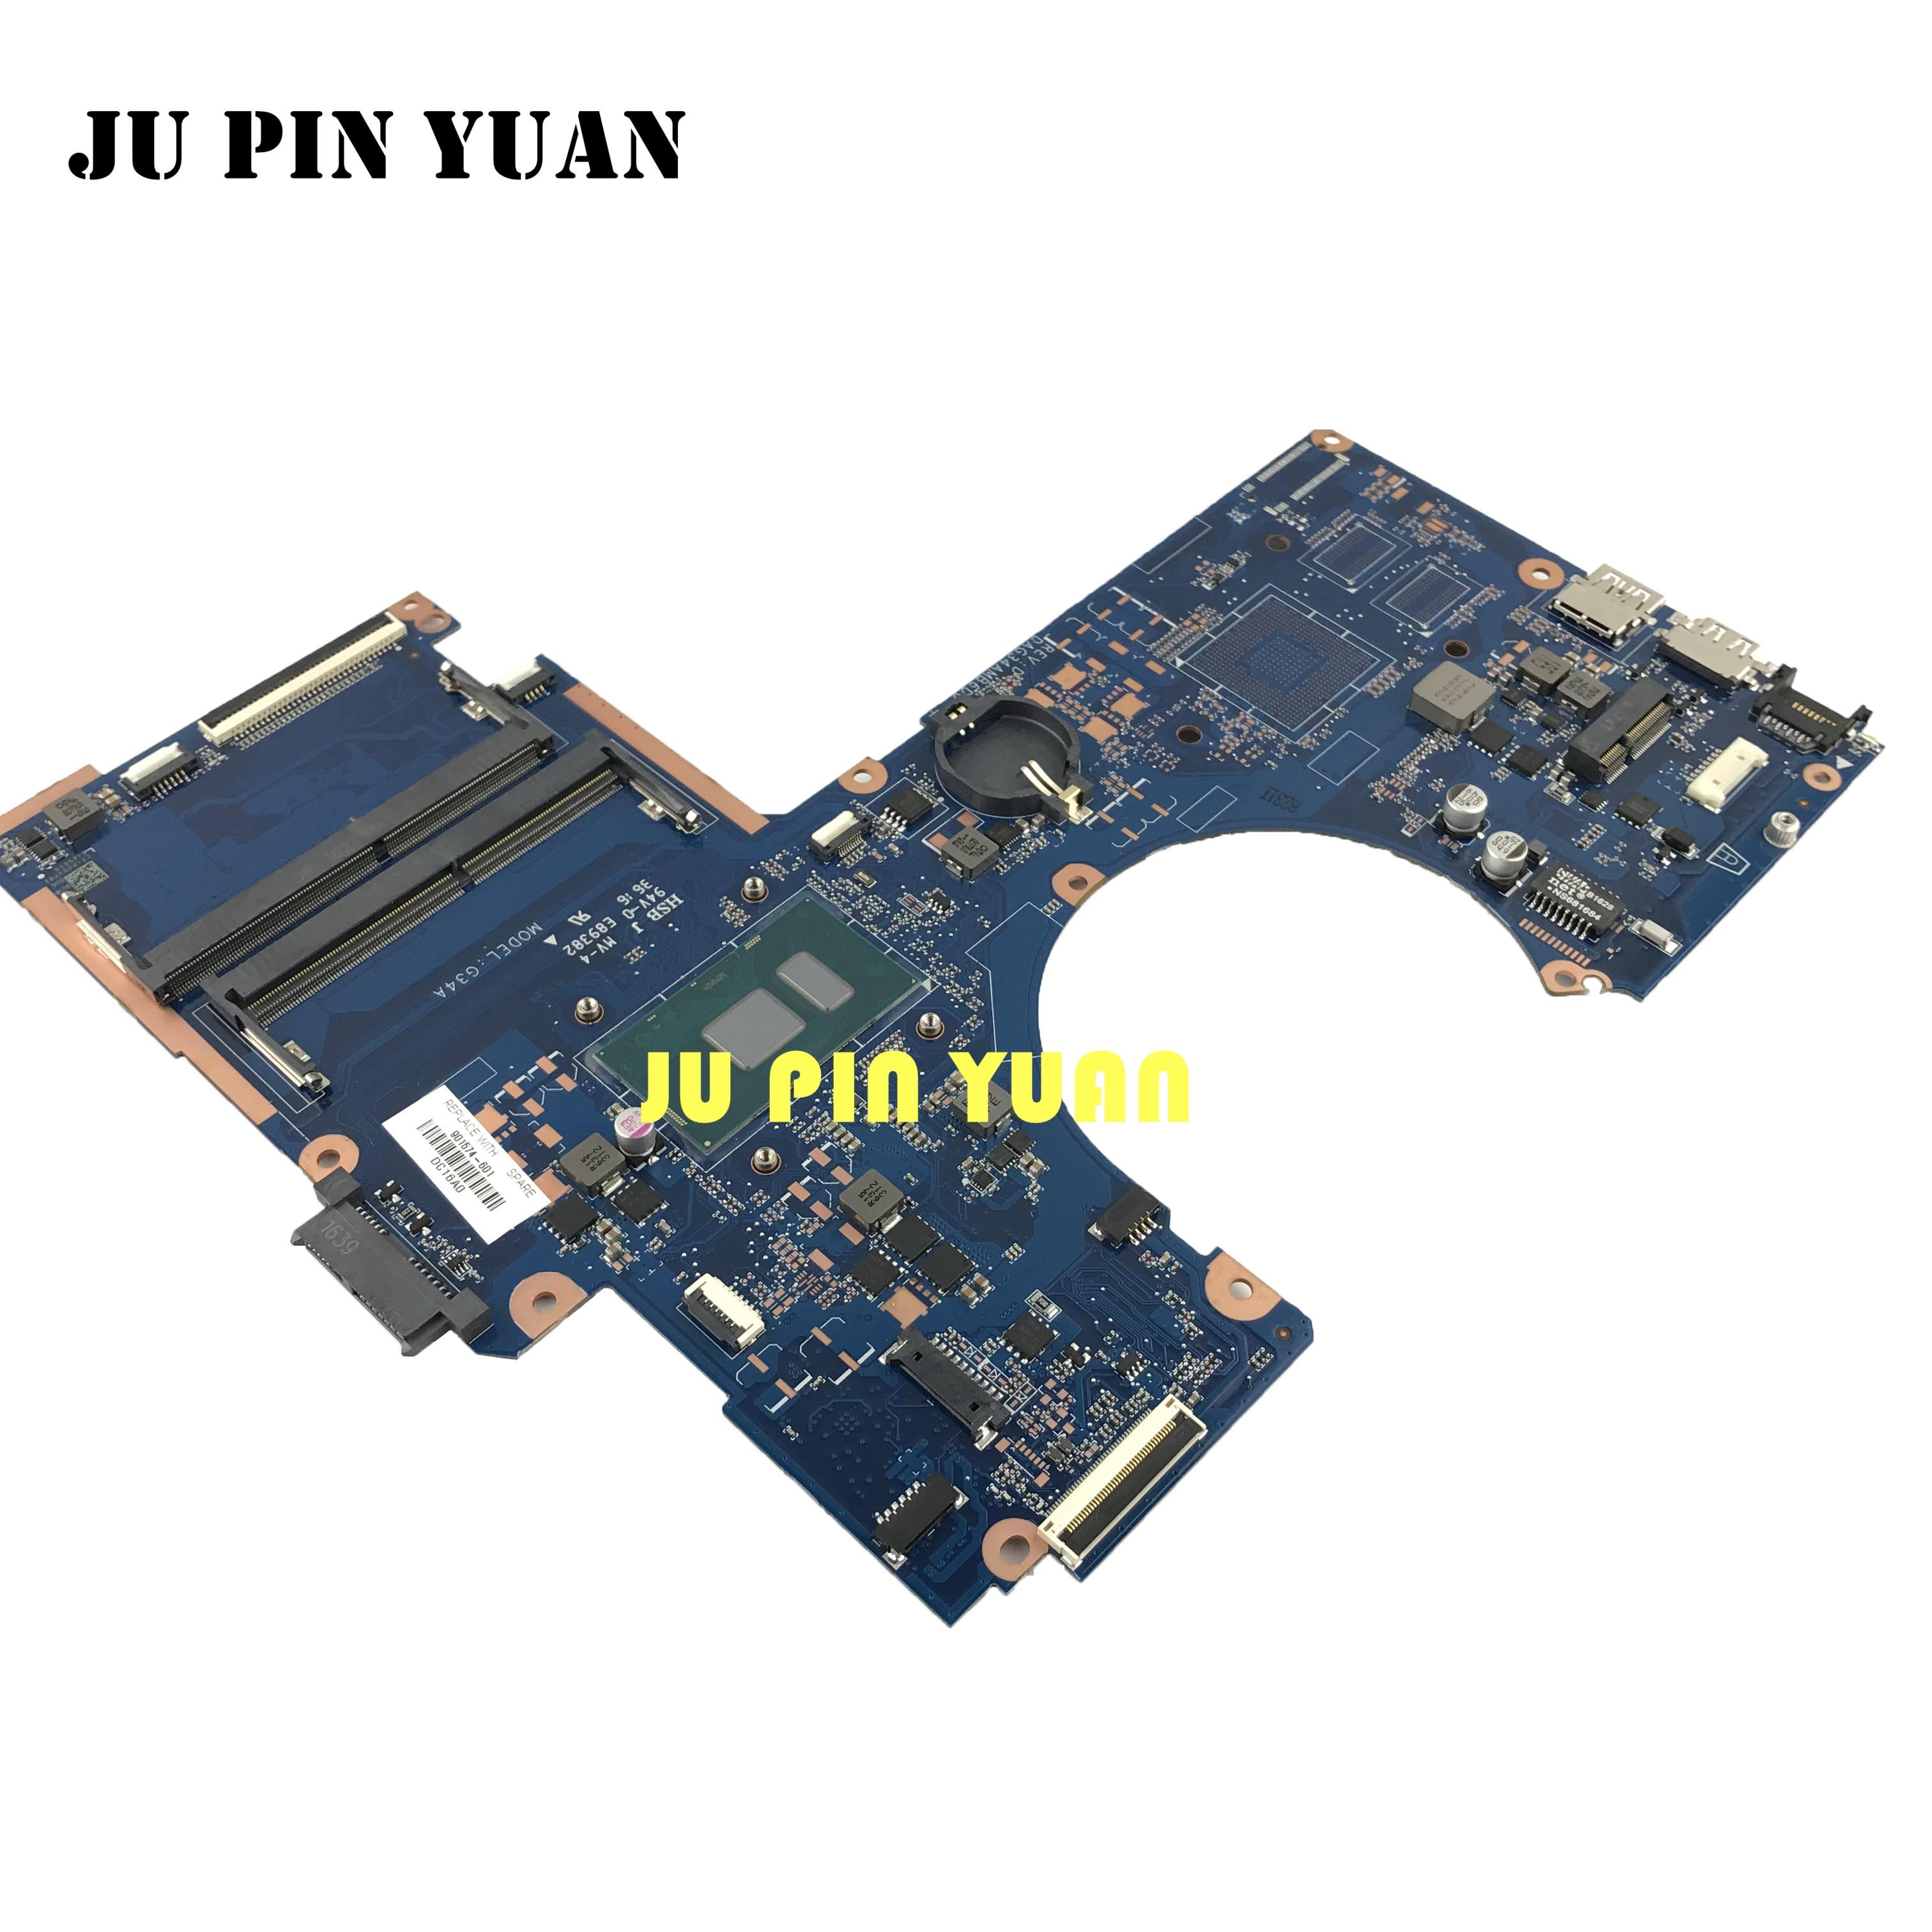 Placa base 901574-601 DAG34AMB6D0 G34A para HP Pavilion serie 15-AU 901574-001 con cpu de i5-7200U totalmente probada